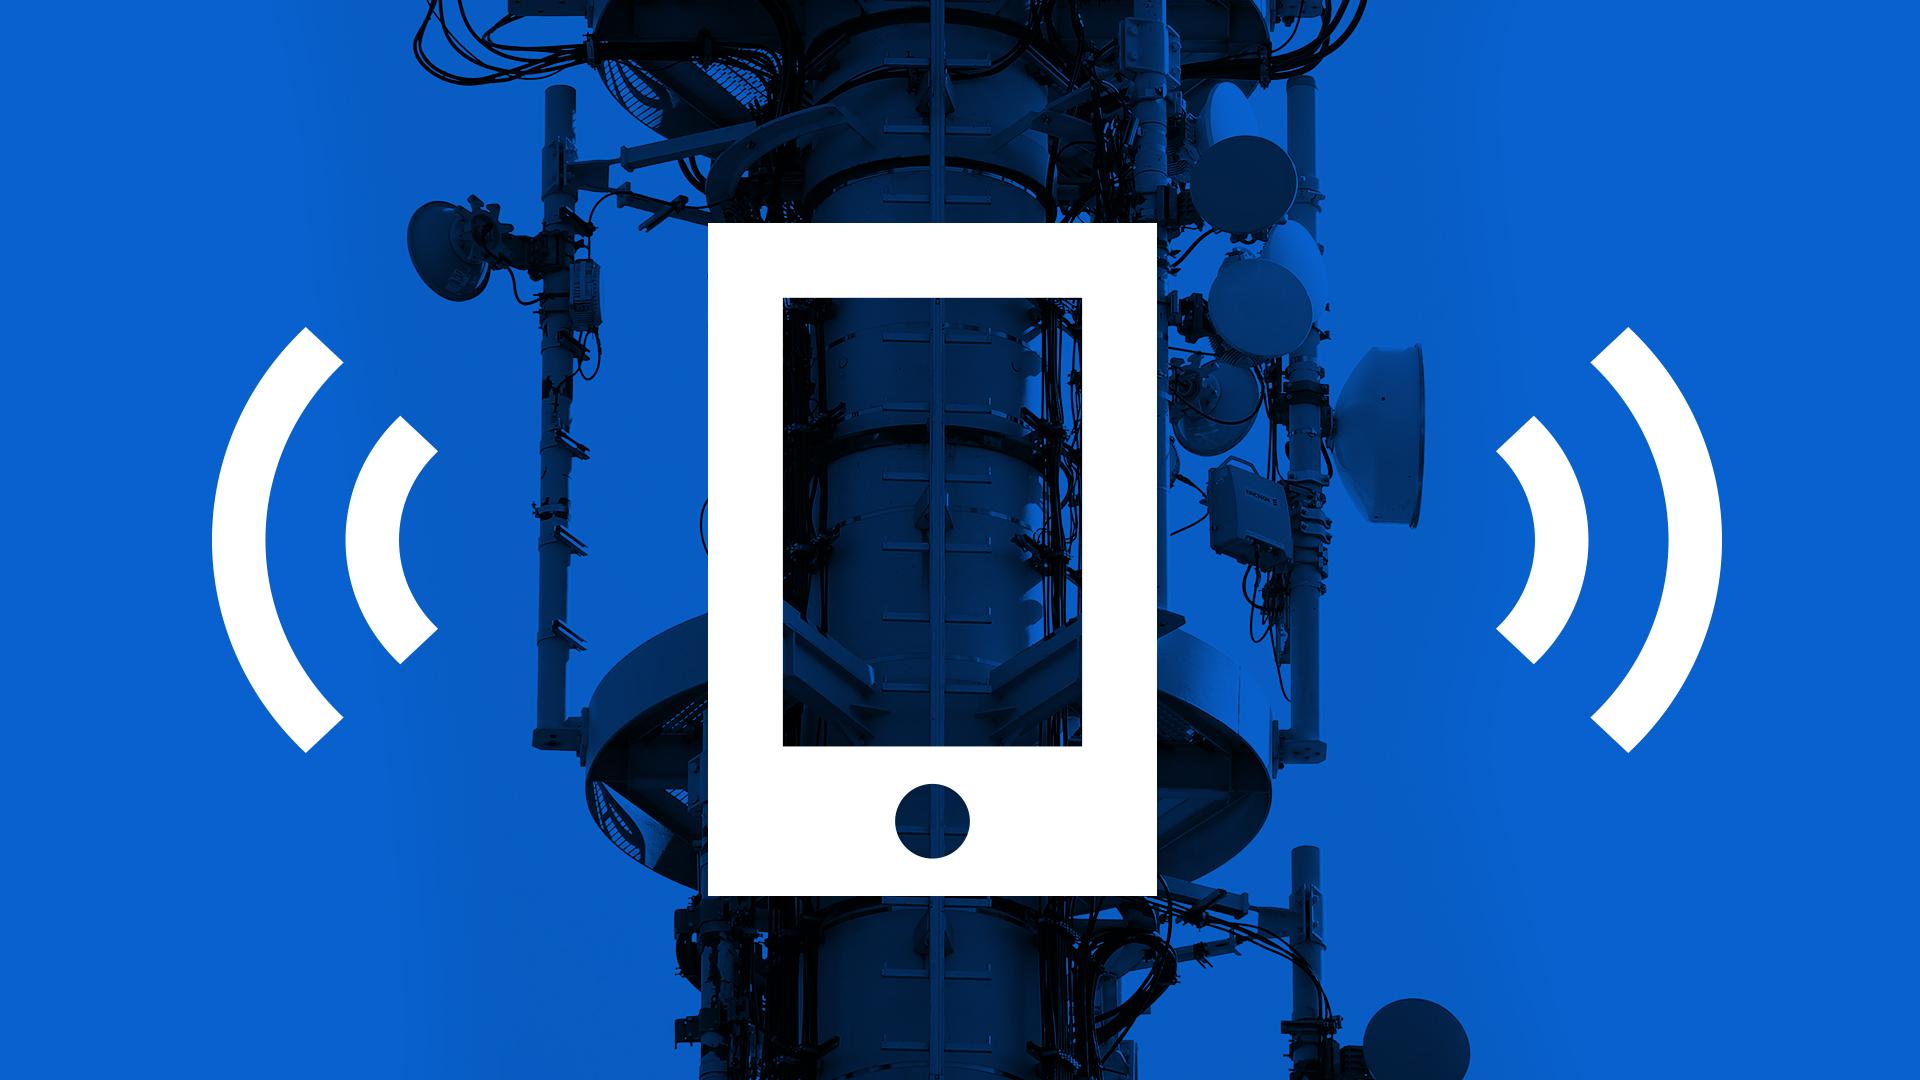 telemast-mobile.jpg